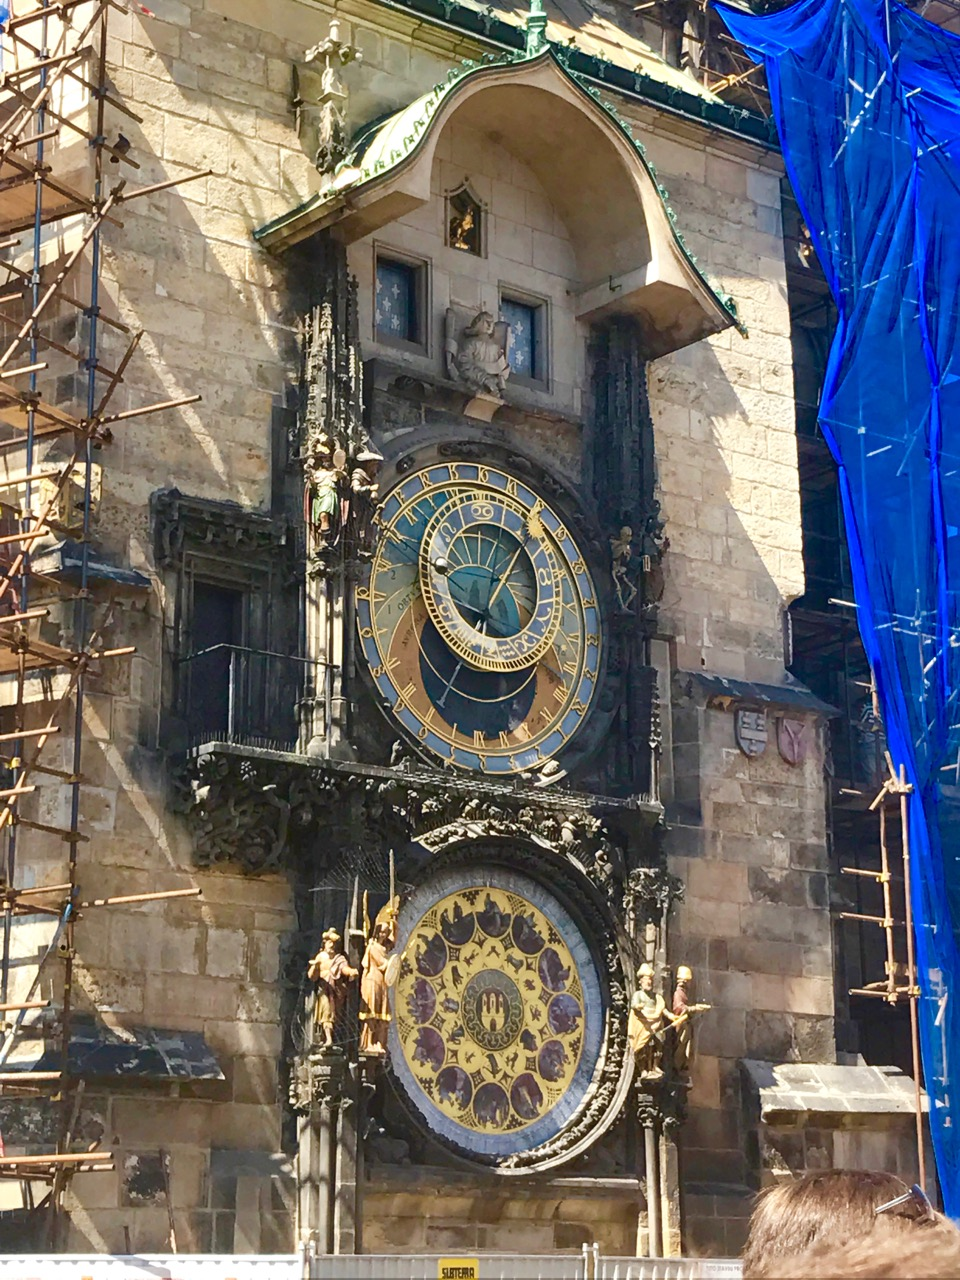 Unfortunately it was under construction, but it was still magnificent!